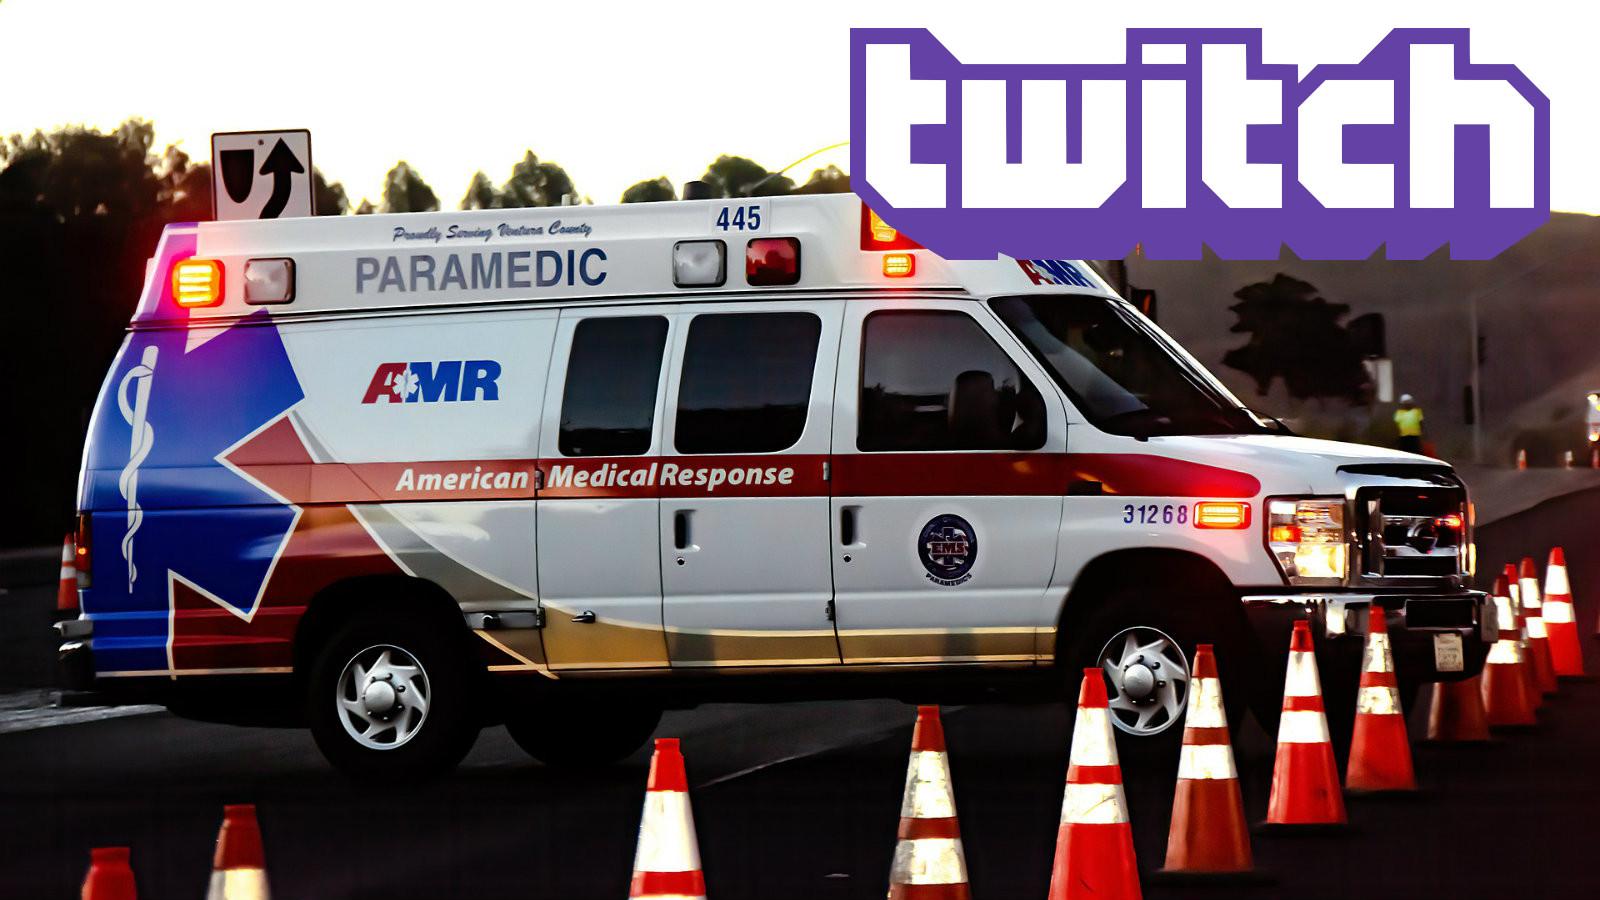 Ambulance with Twitch logo